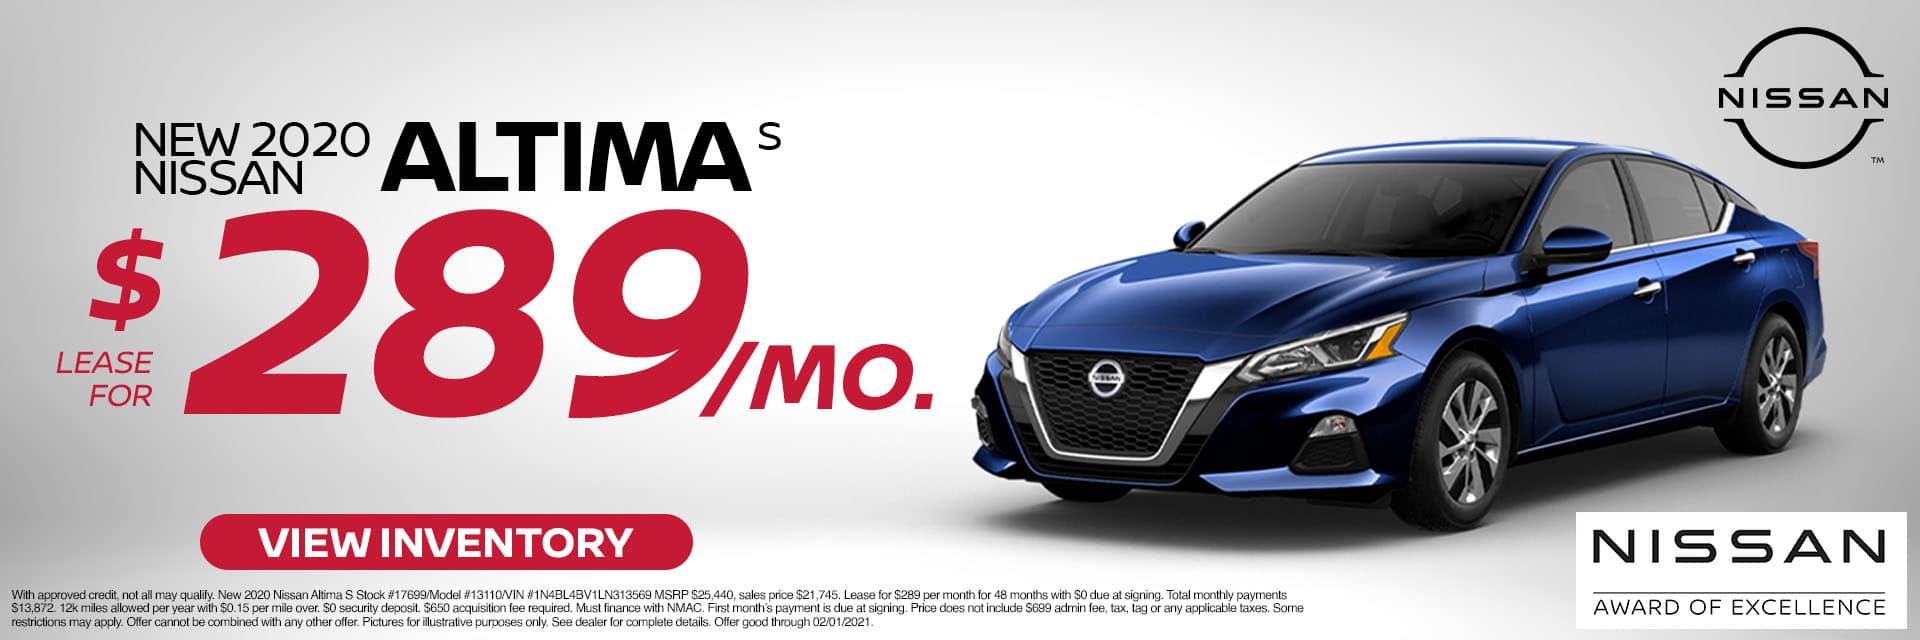 1CNSN-January 2021-2020 Nissan Altima